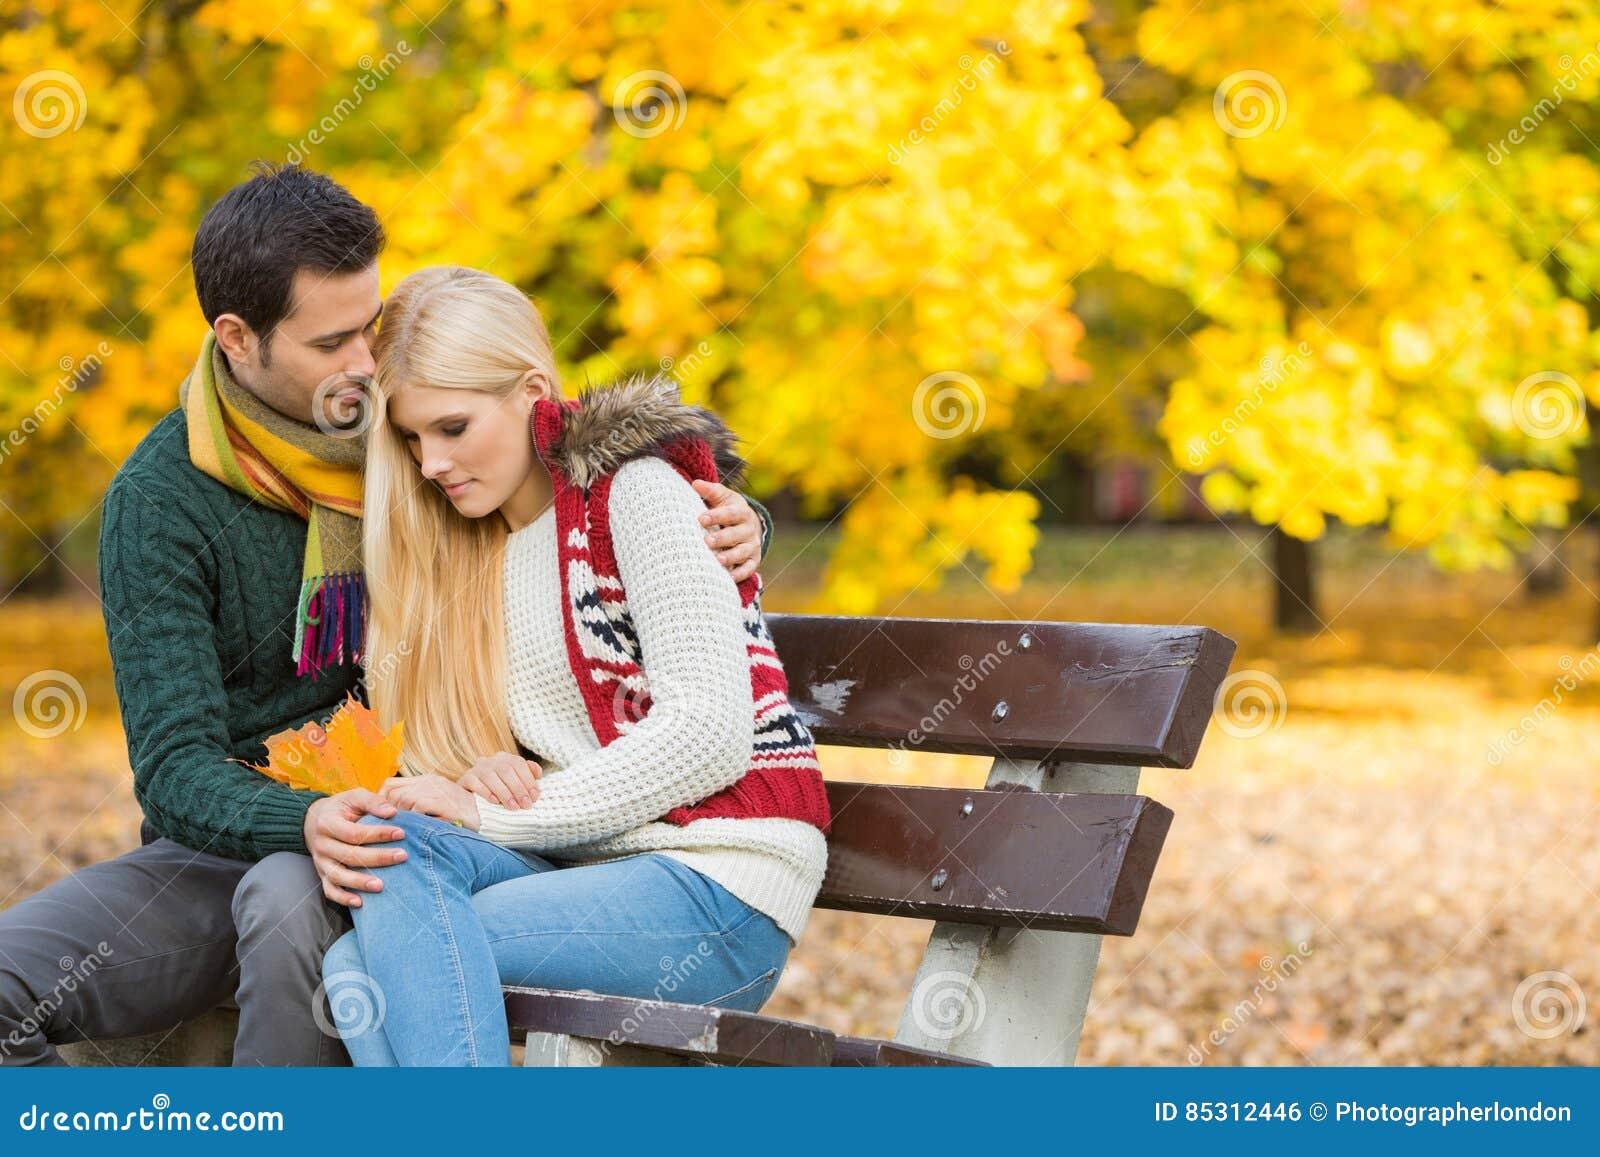 love shyness in men